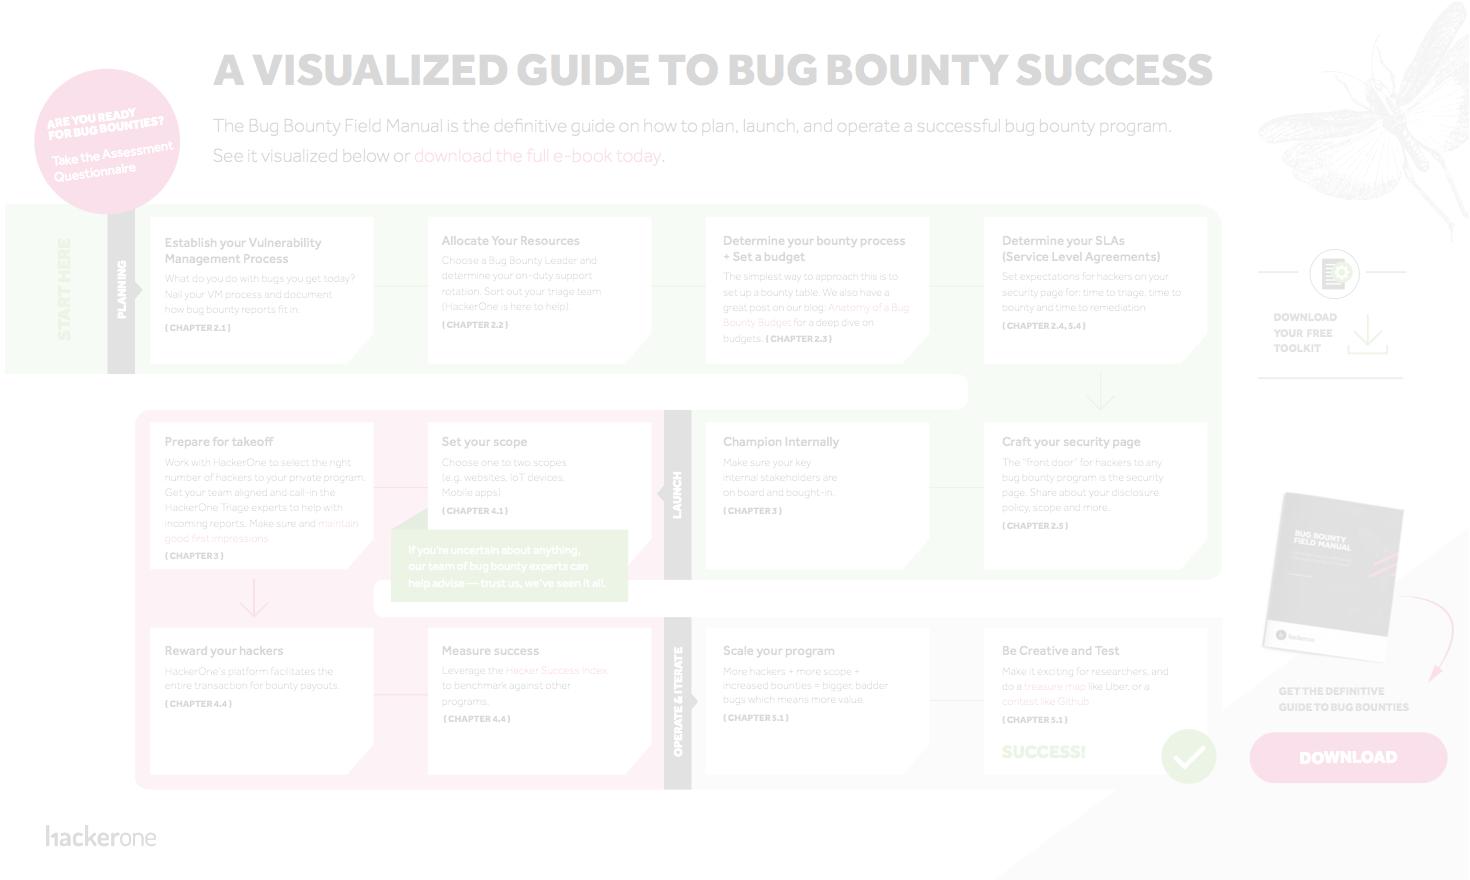 The Visual Guide to Bug Bounty Success | HackerOne